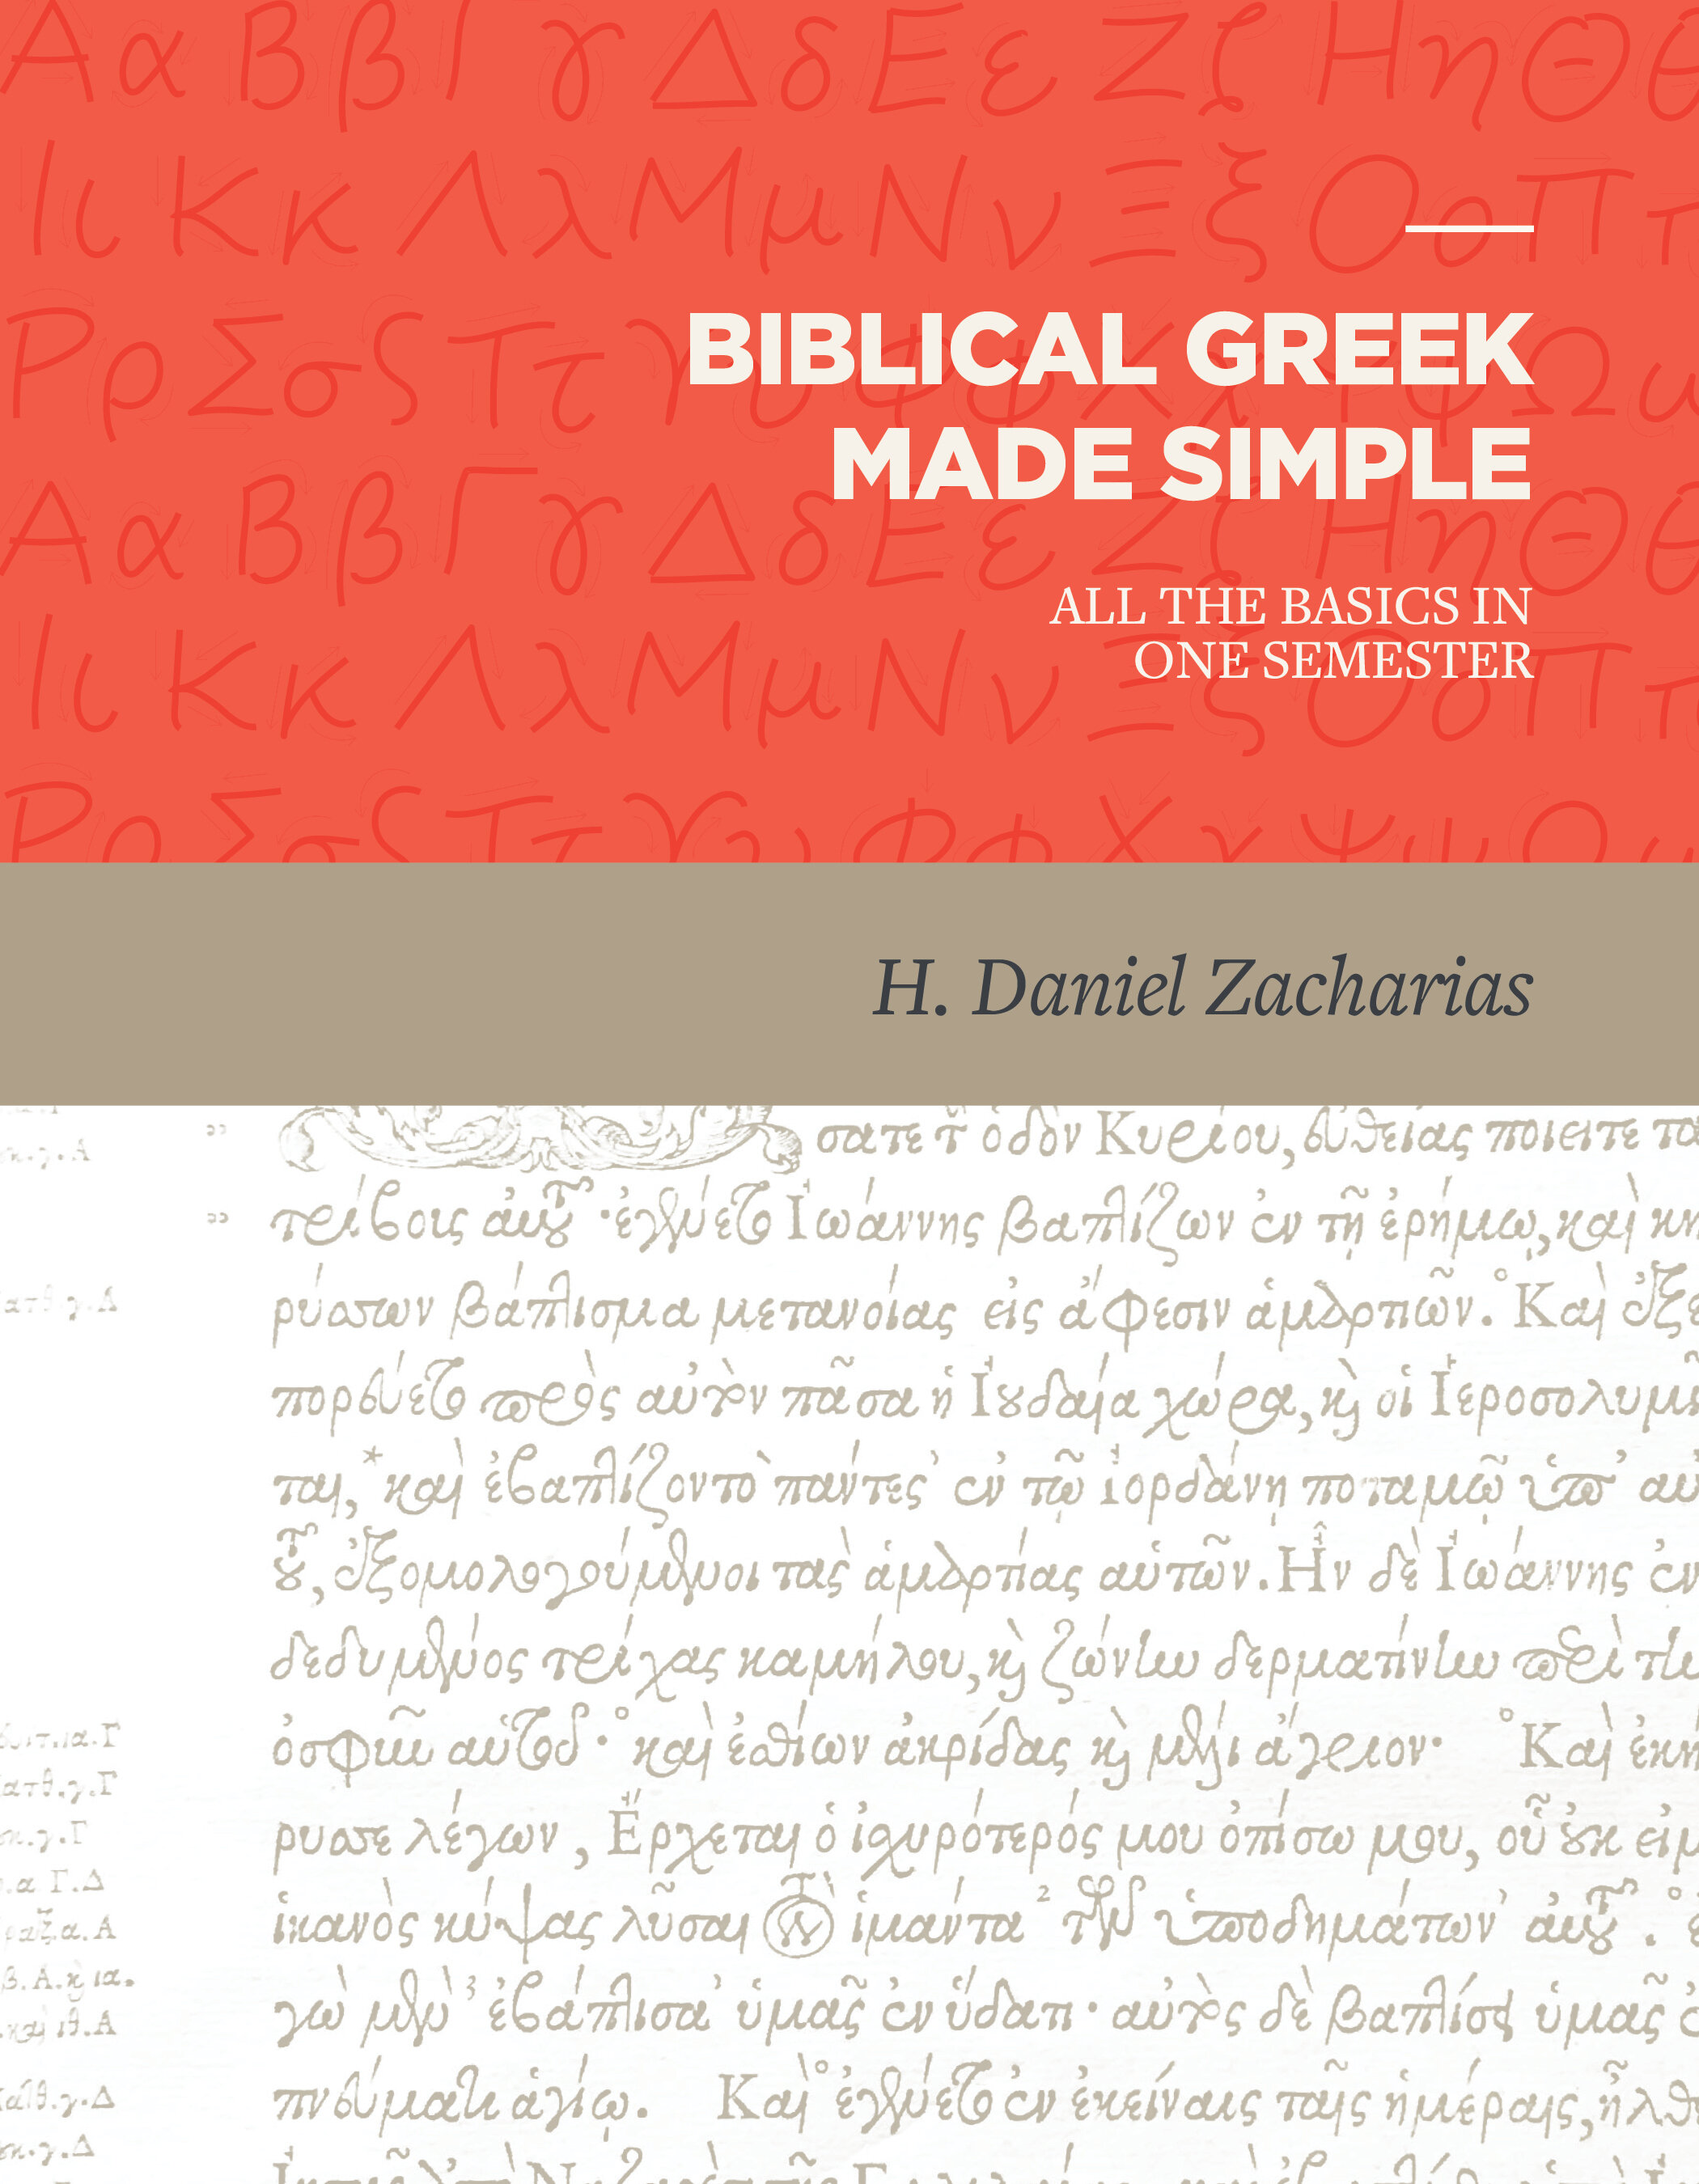 Biblical Greek Made Simple